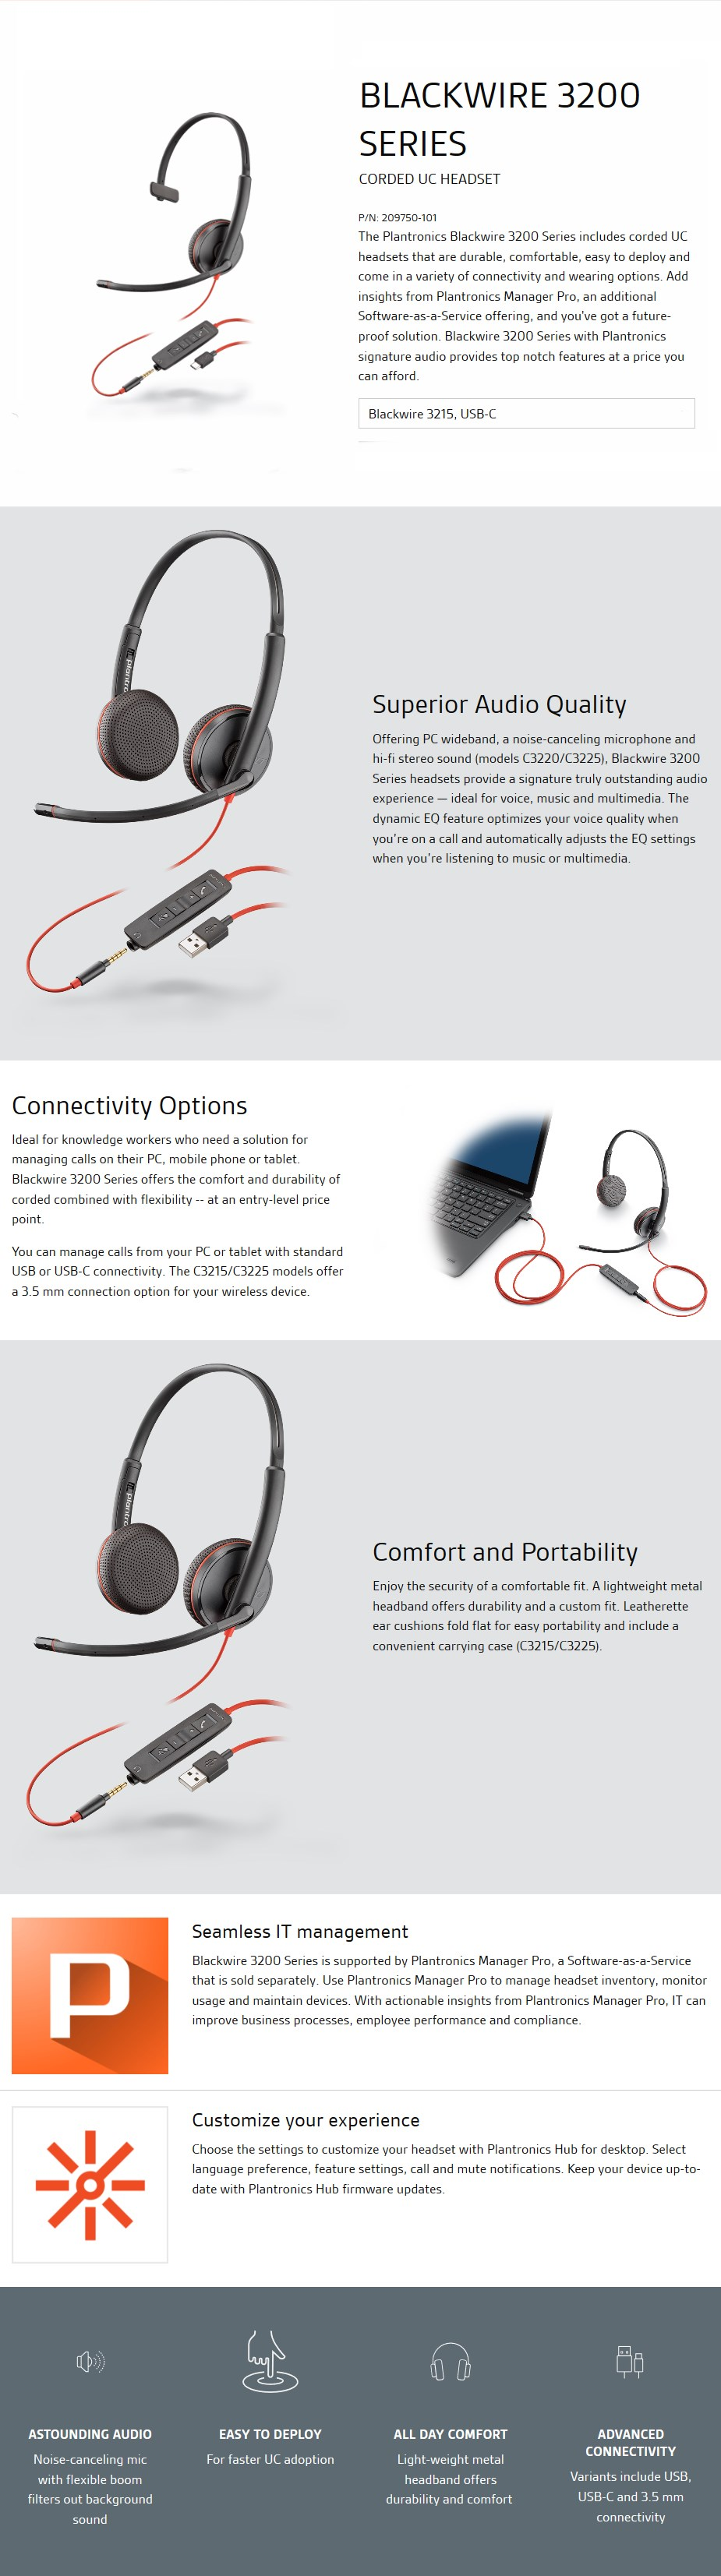 Plantronics Blackwire C3215 Monaural UC USB-C Headset w/ 3.5mm - Desktop Overview 1